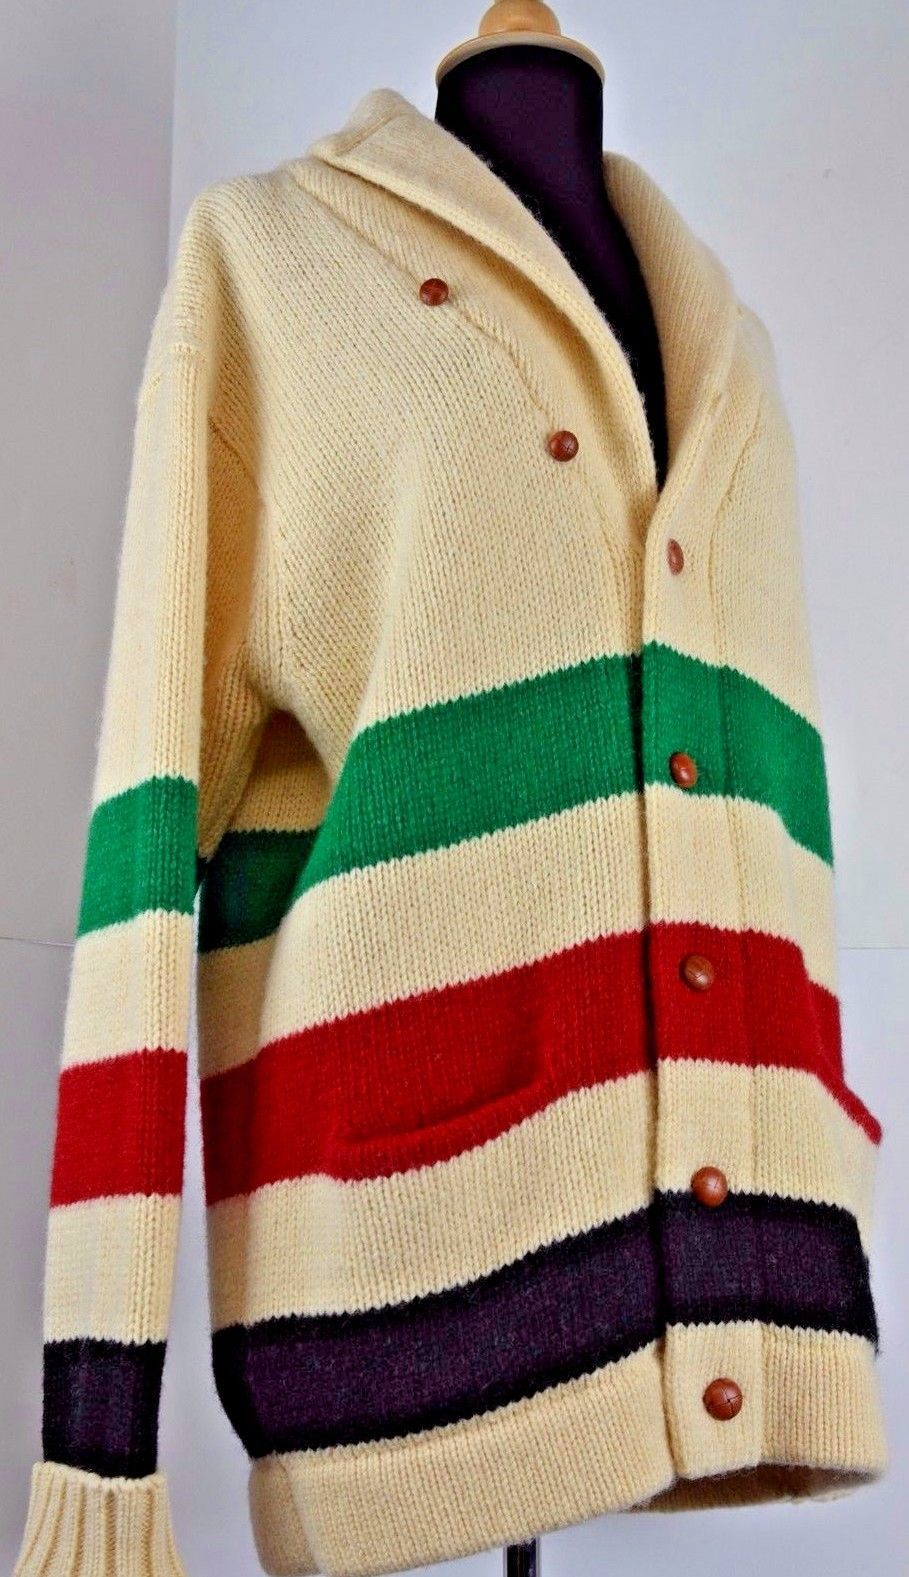 9a45eedd9f21a Vintage Ralph Lauren Shawl Collar Hudson Bay Cardigan Sweater Preppy  Stadium Stripe Wool Women's Red Green Navy Cream